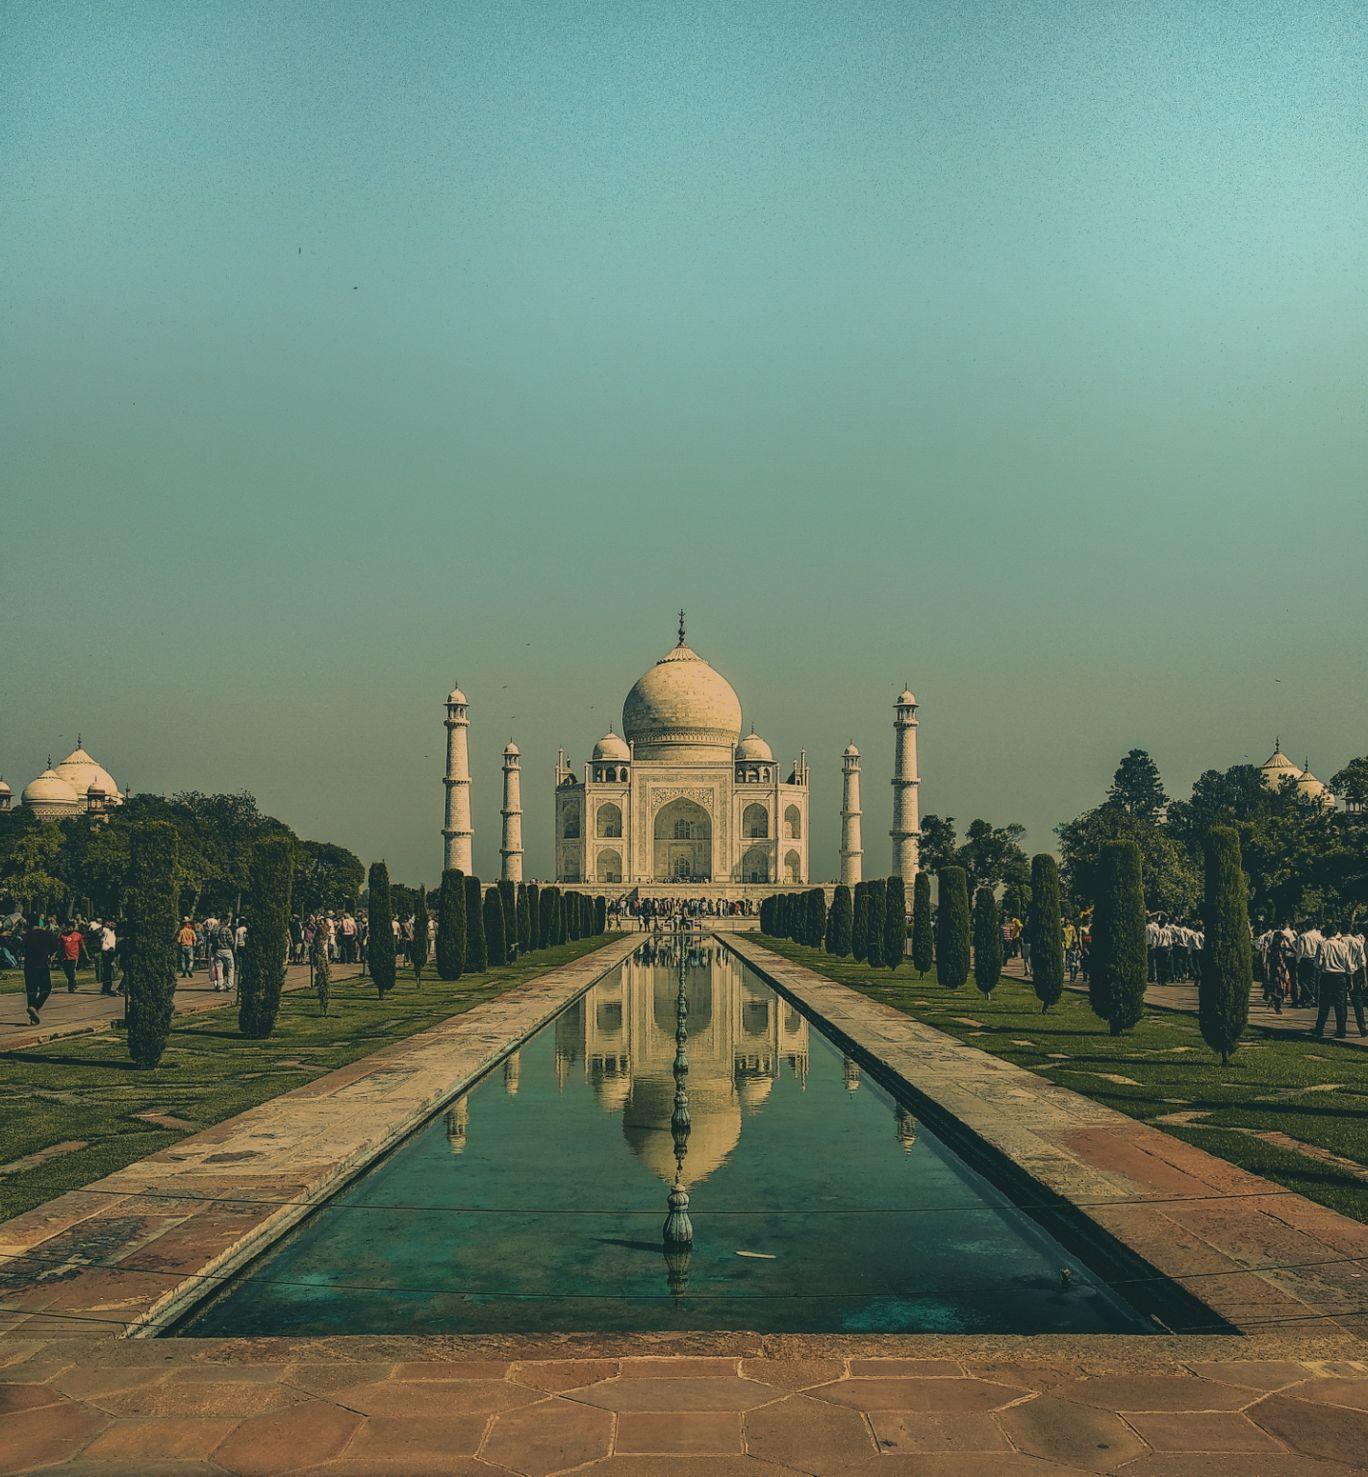 Photo of Agra By Piyush Jakhar